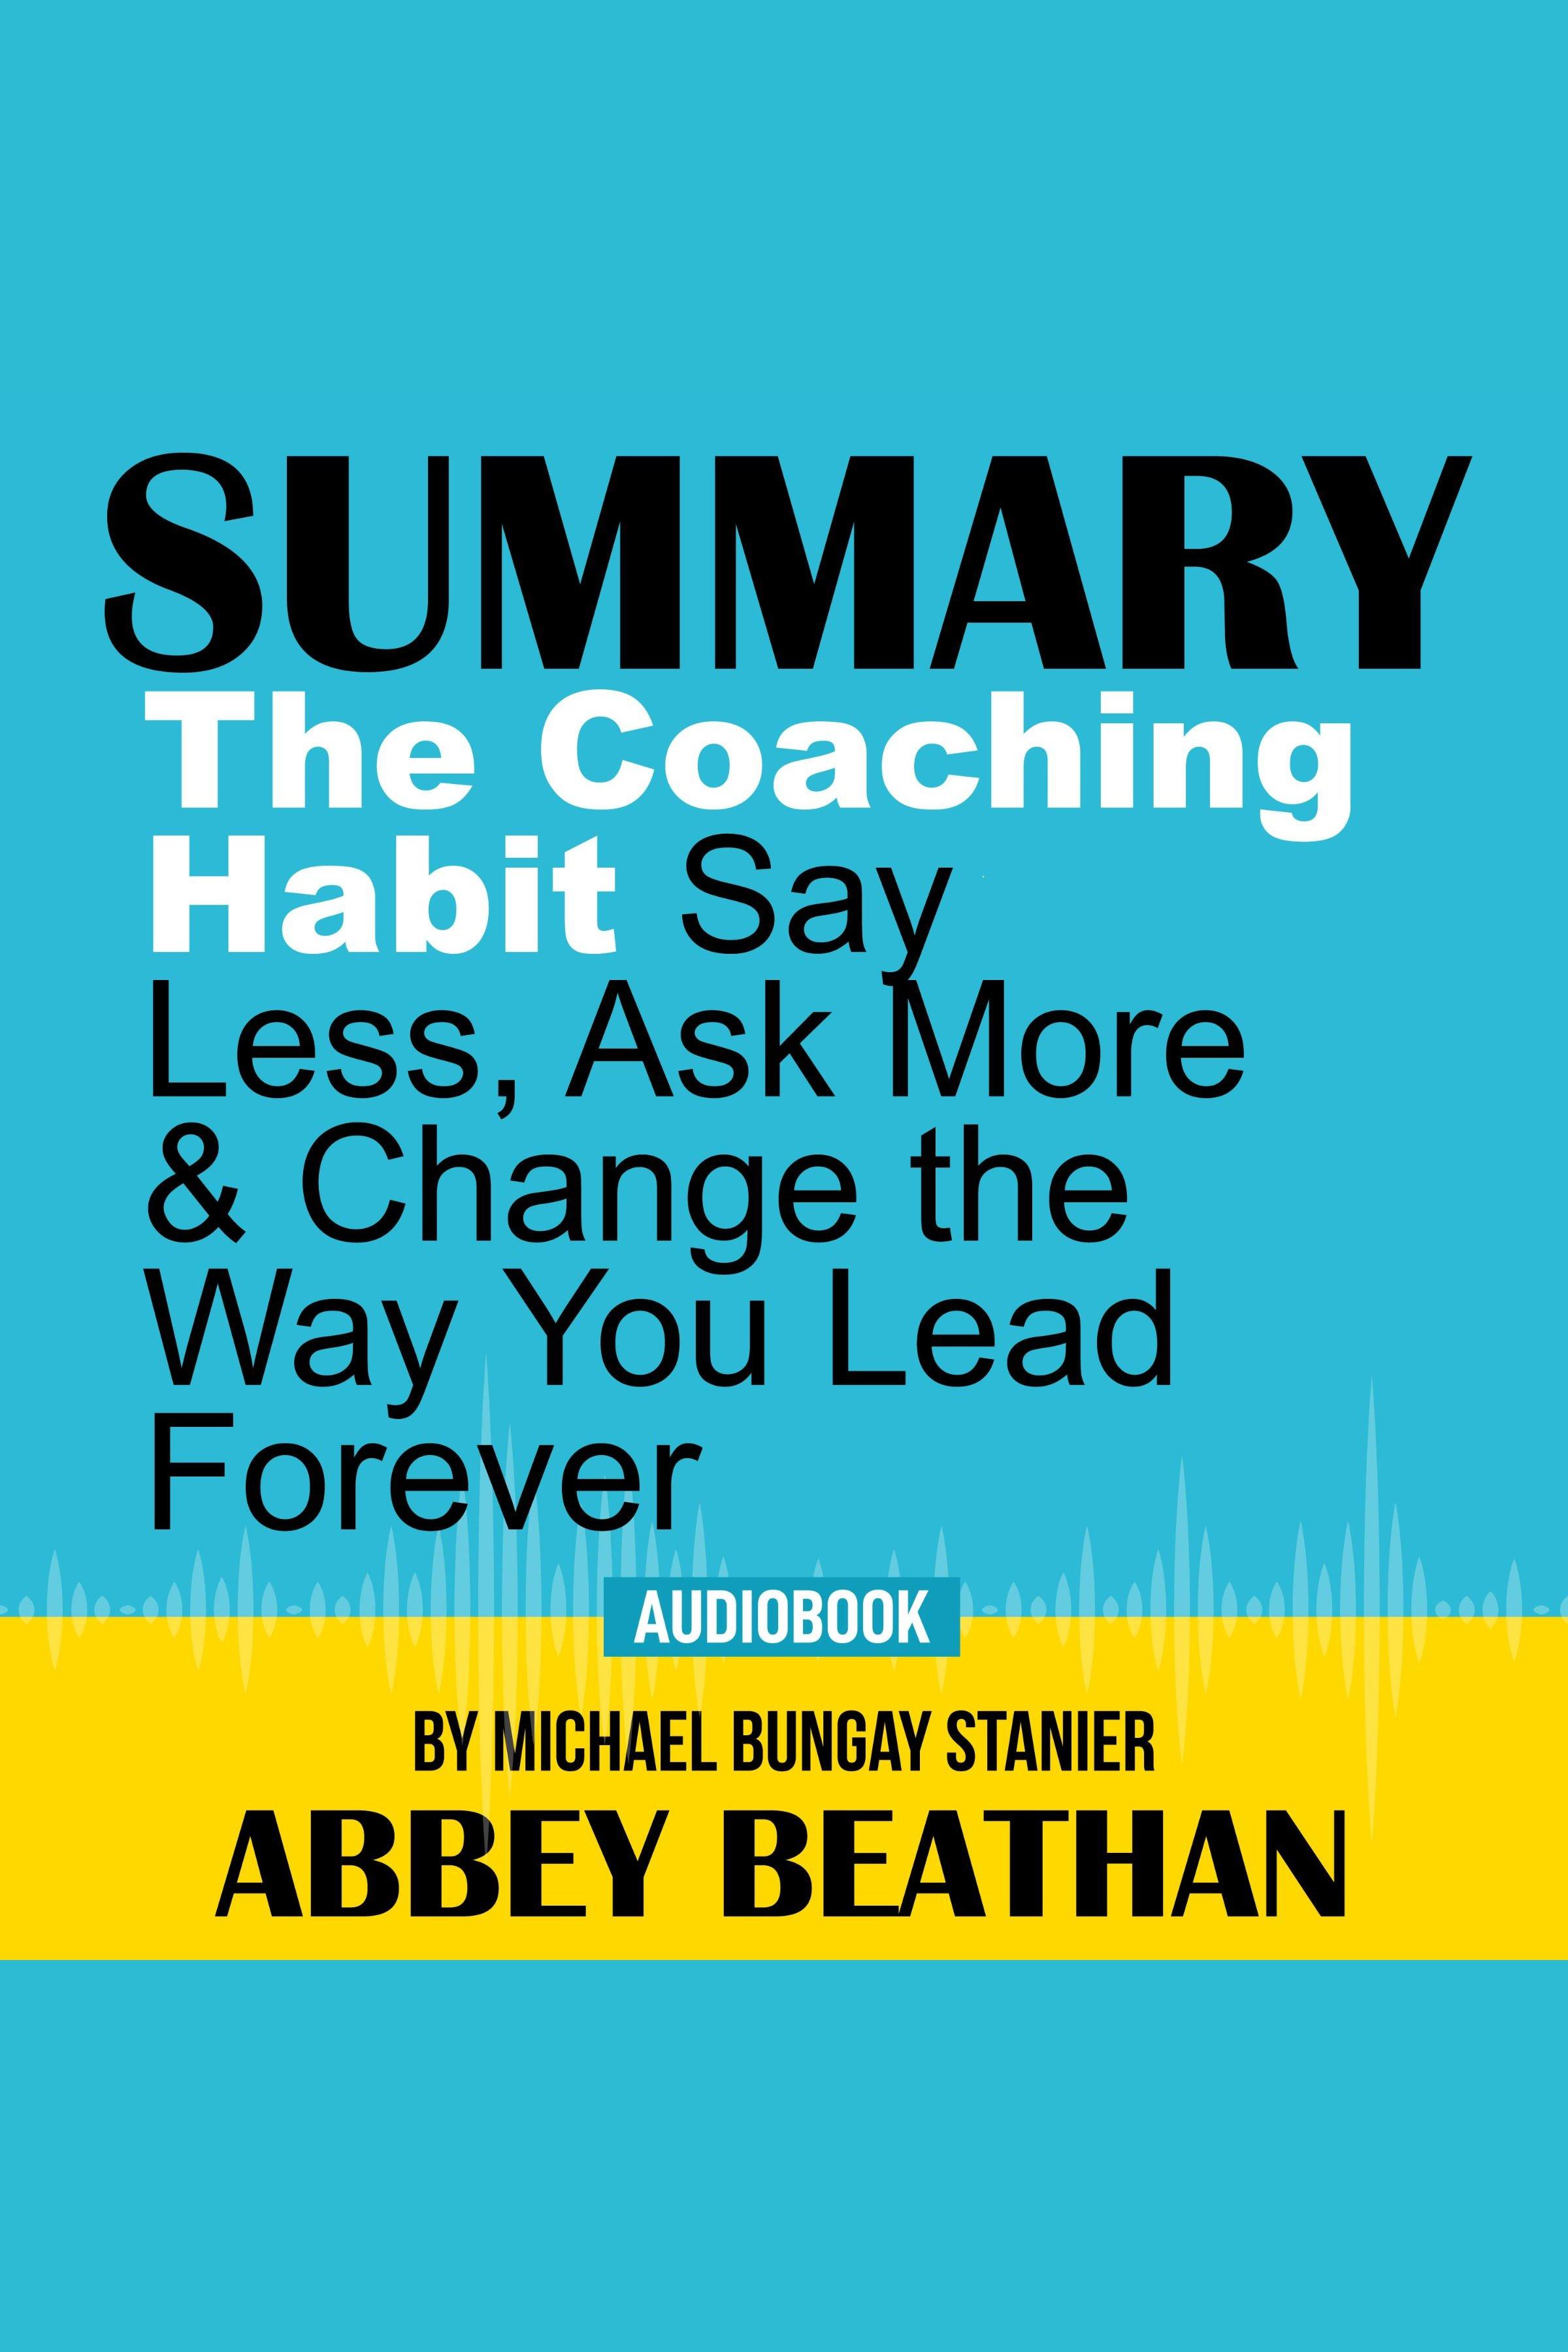 Esta es la portada del audiolibro Summary of The Coaching Habit: Say Less, Ask More & Change the Way You Lead Forever by Michael Bungay Stanier